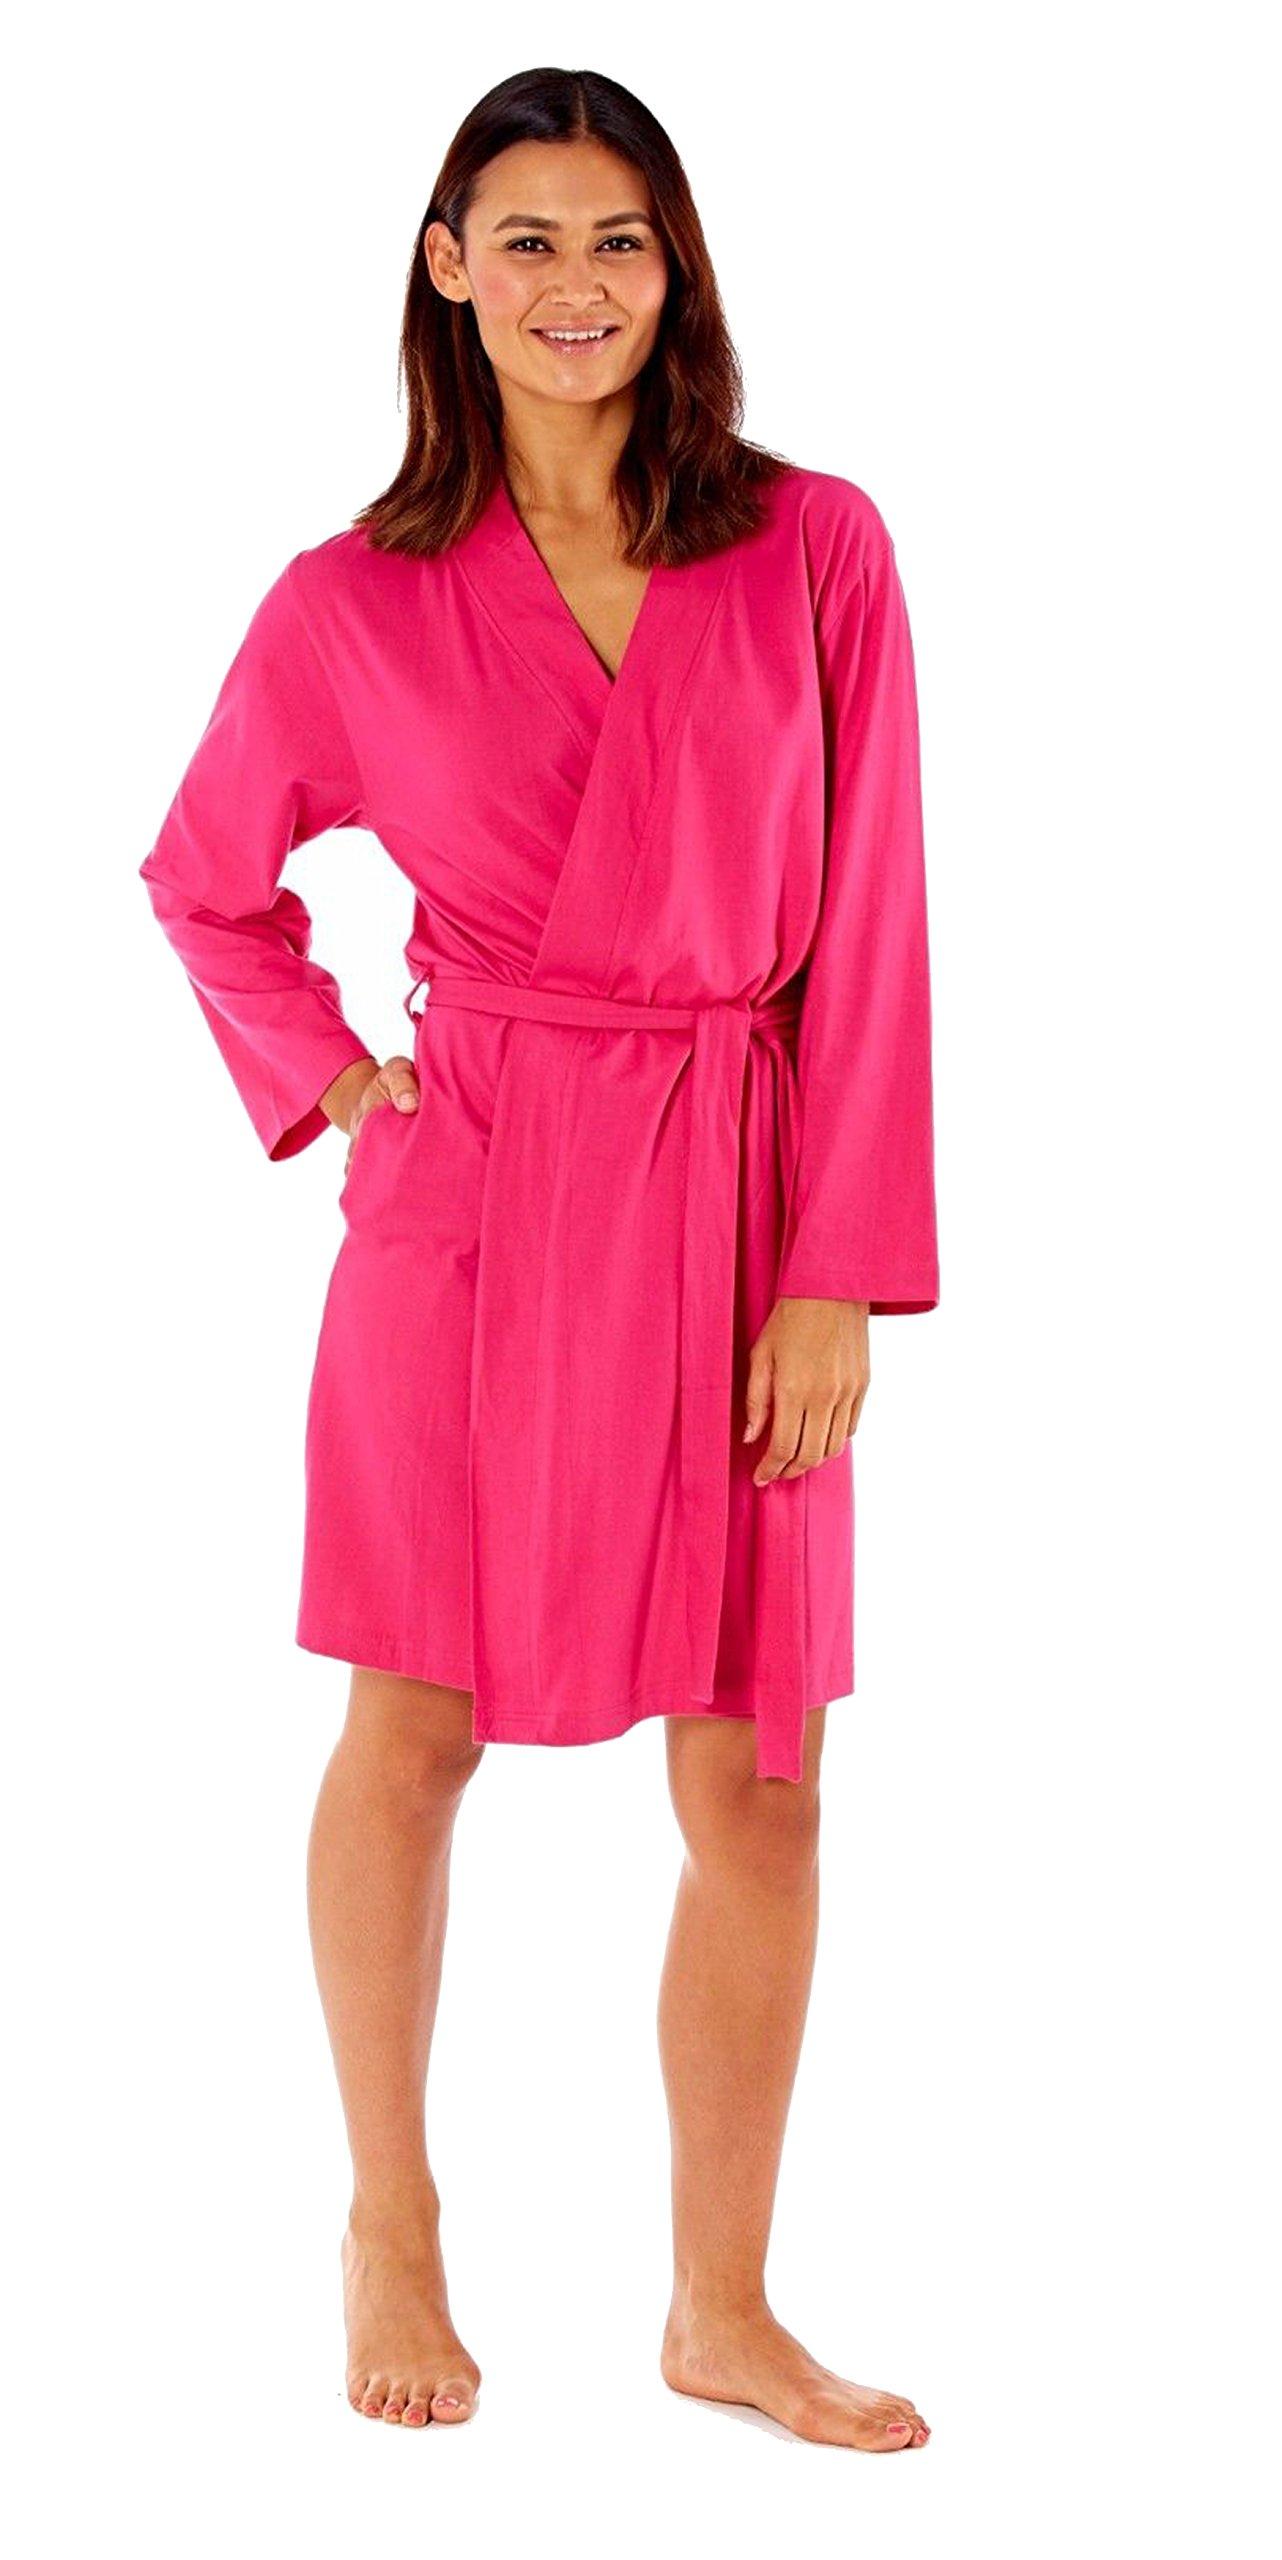 Hot Pink Ladies Dressing Gown Summer Cotton Lightweight Robe- UK 8 ...